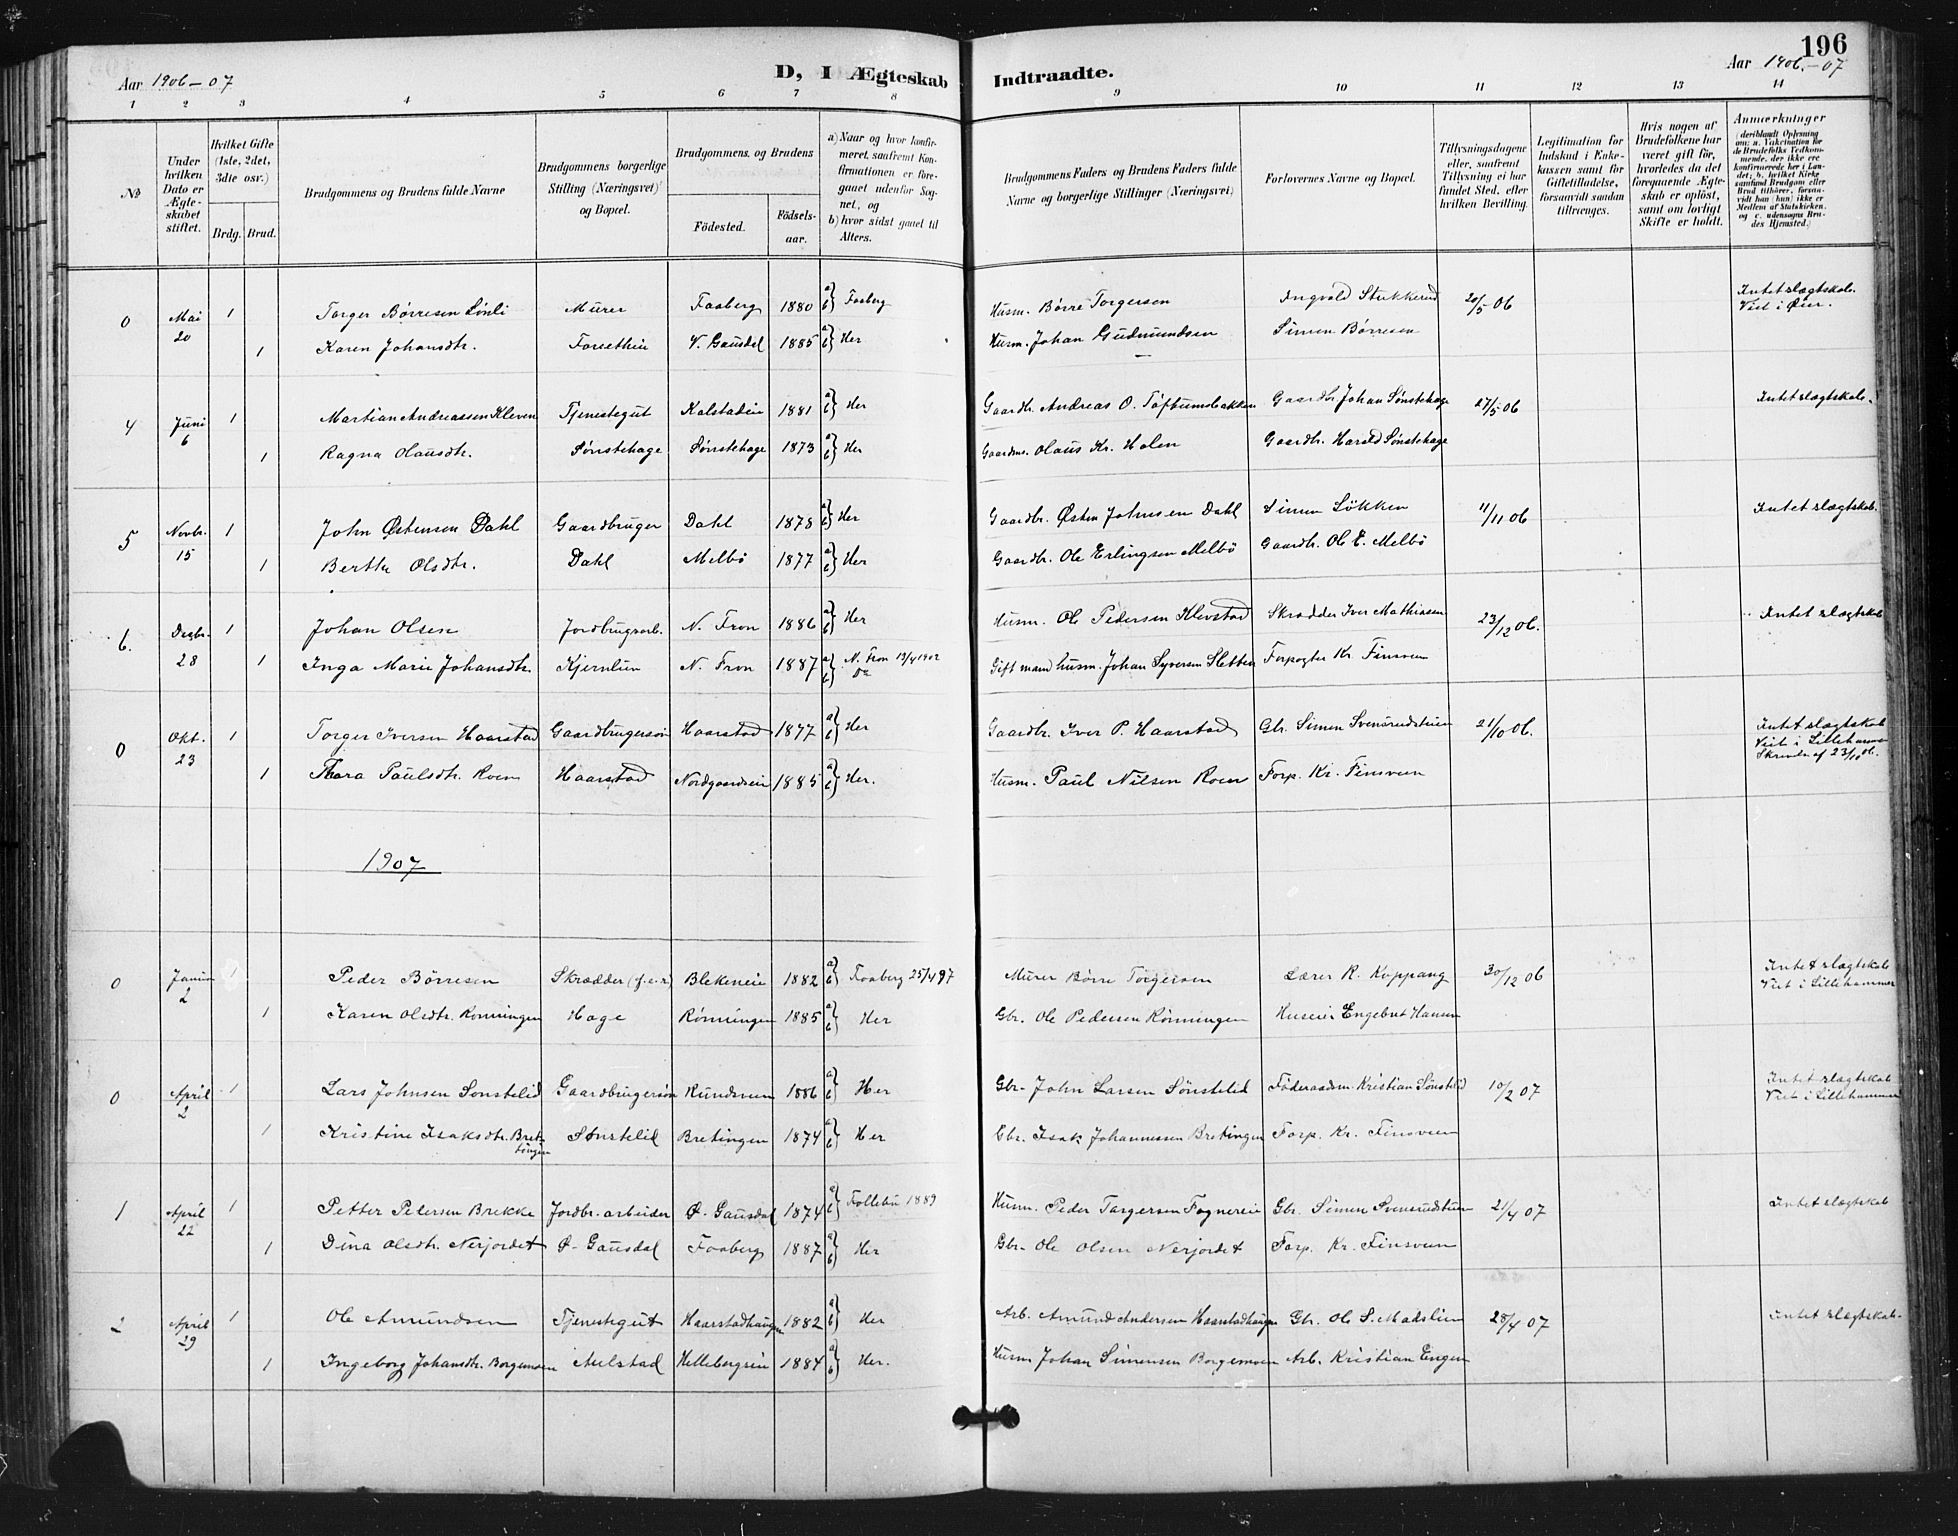 SAH, Vestre Gausdal prestekontor, Klokkerbok nr. 3, 1896-1925, s. 196